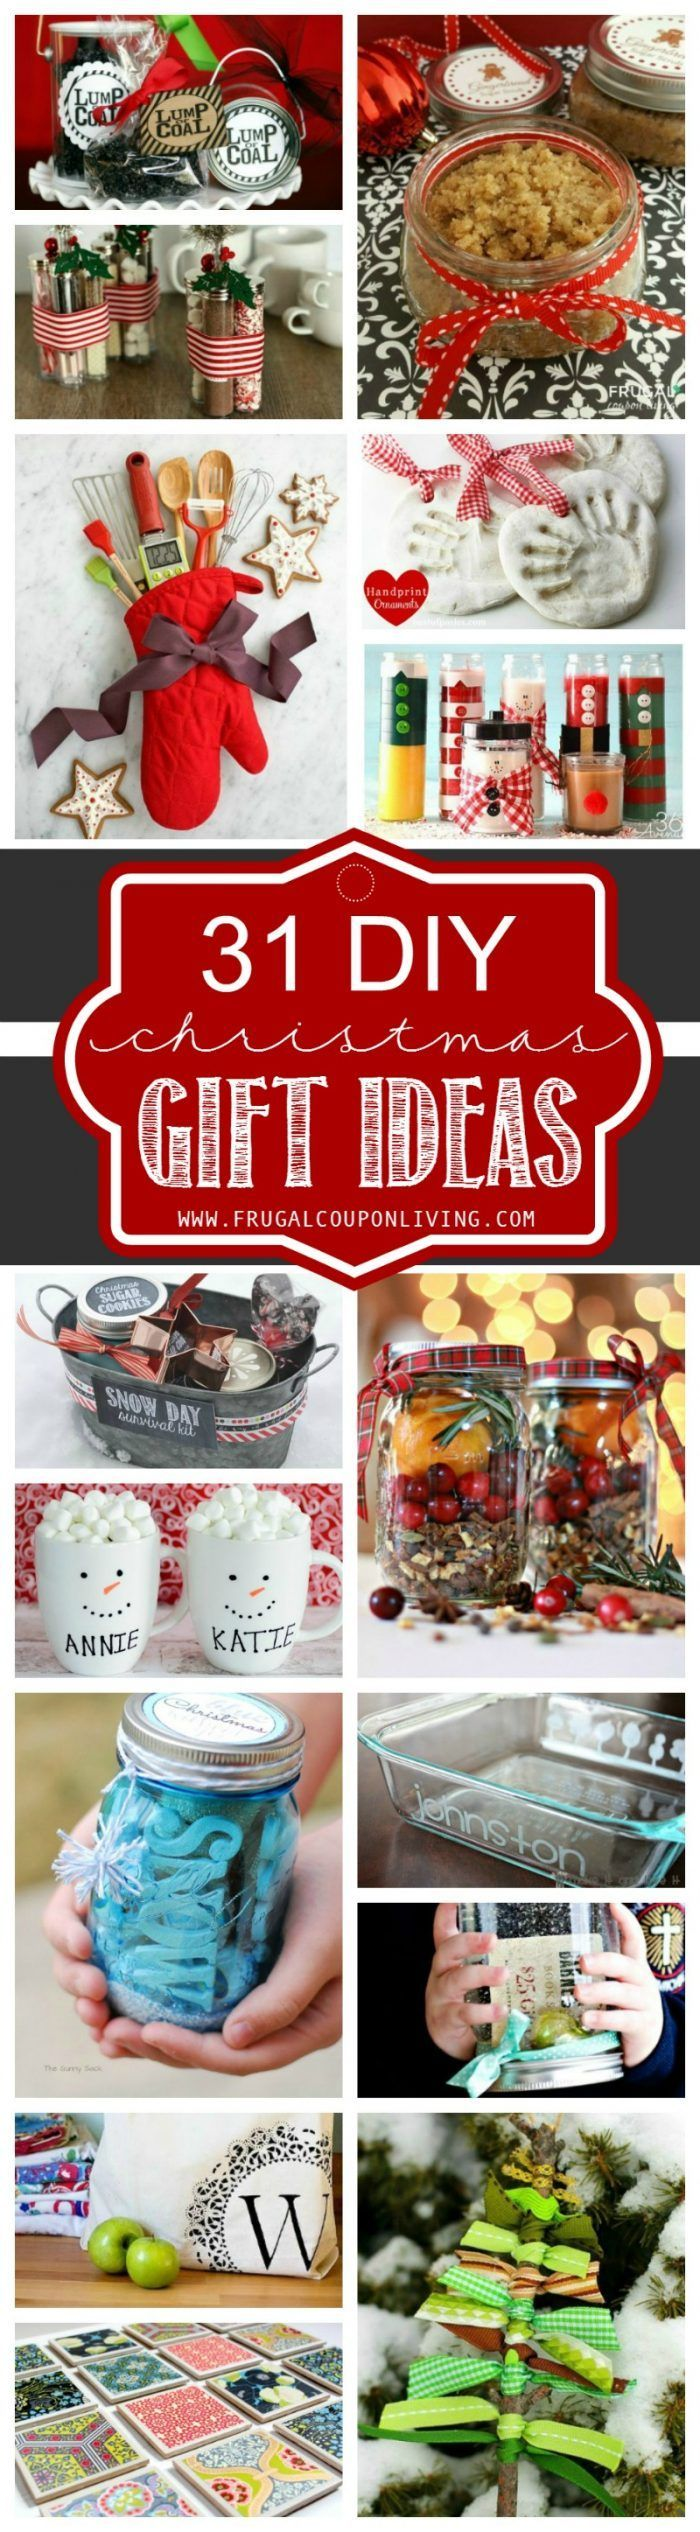 31 DIY Christmas Gift Ideas | Gift ideas for everyone | Pinterest ...